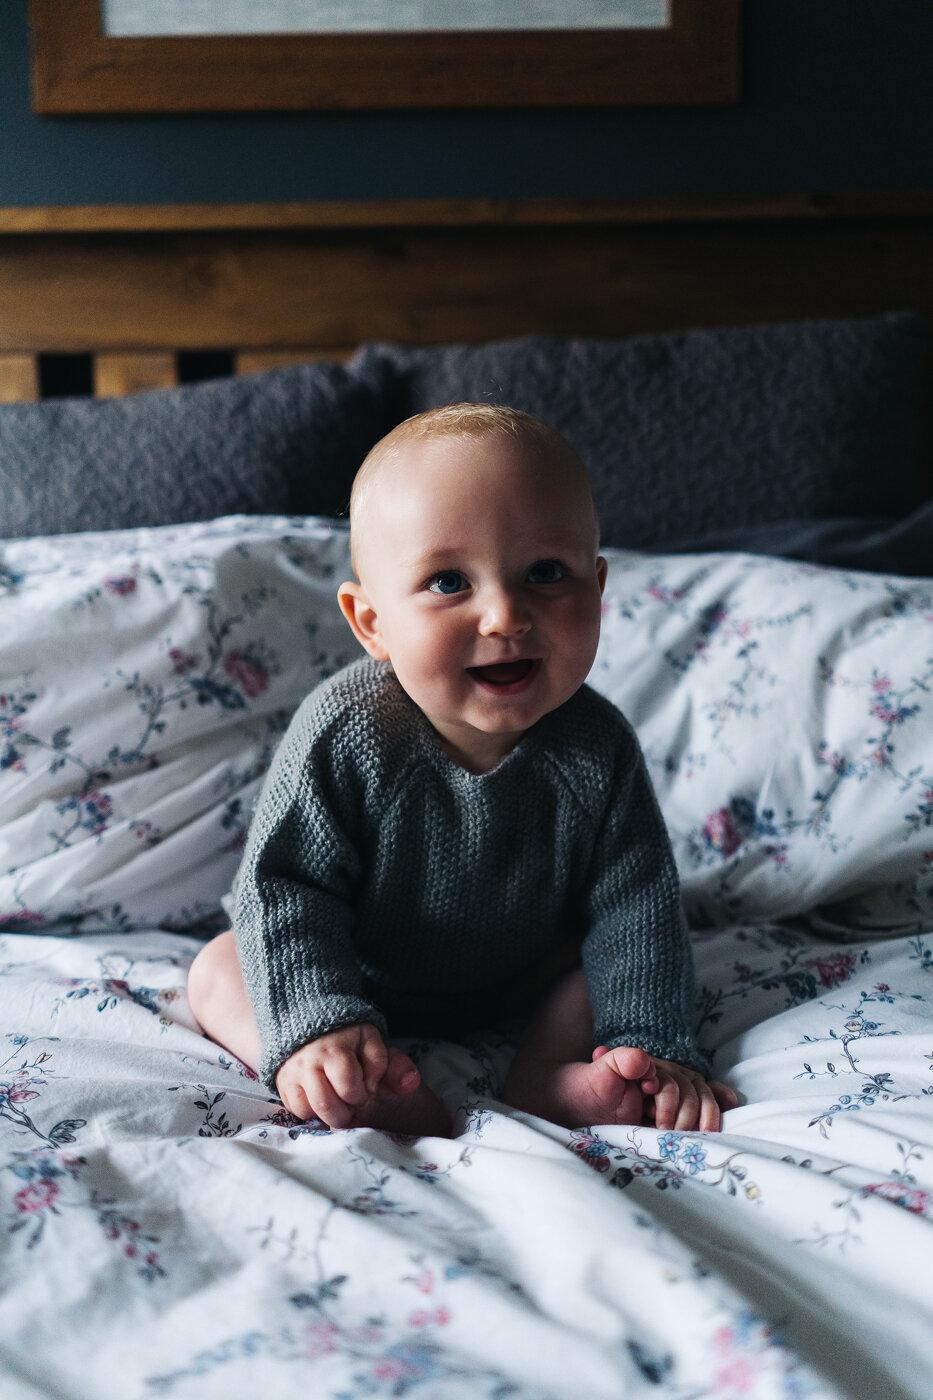 family-photography-teesside-north-yorkshire-newborn-baby-family-shoot-0018.jpg